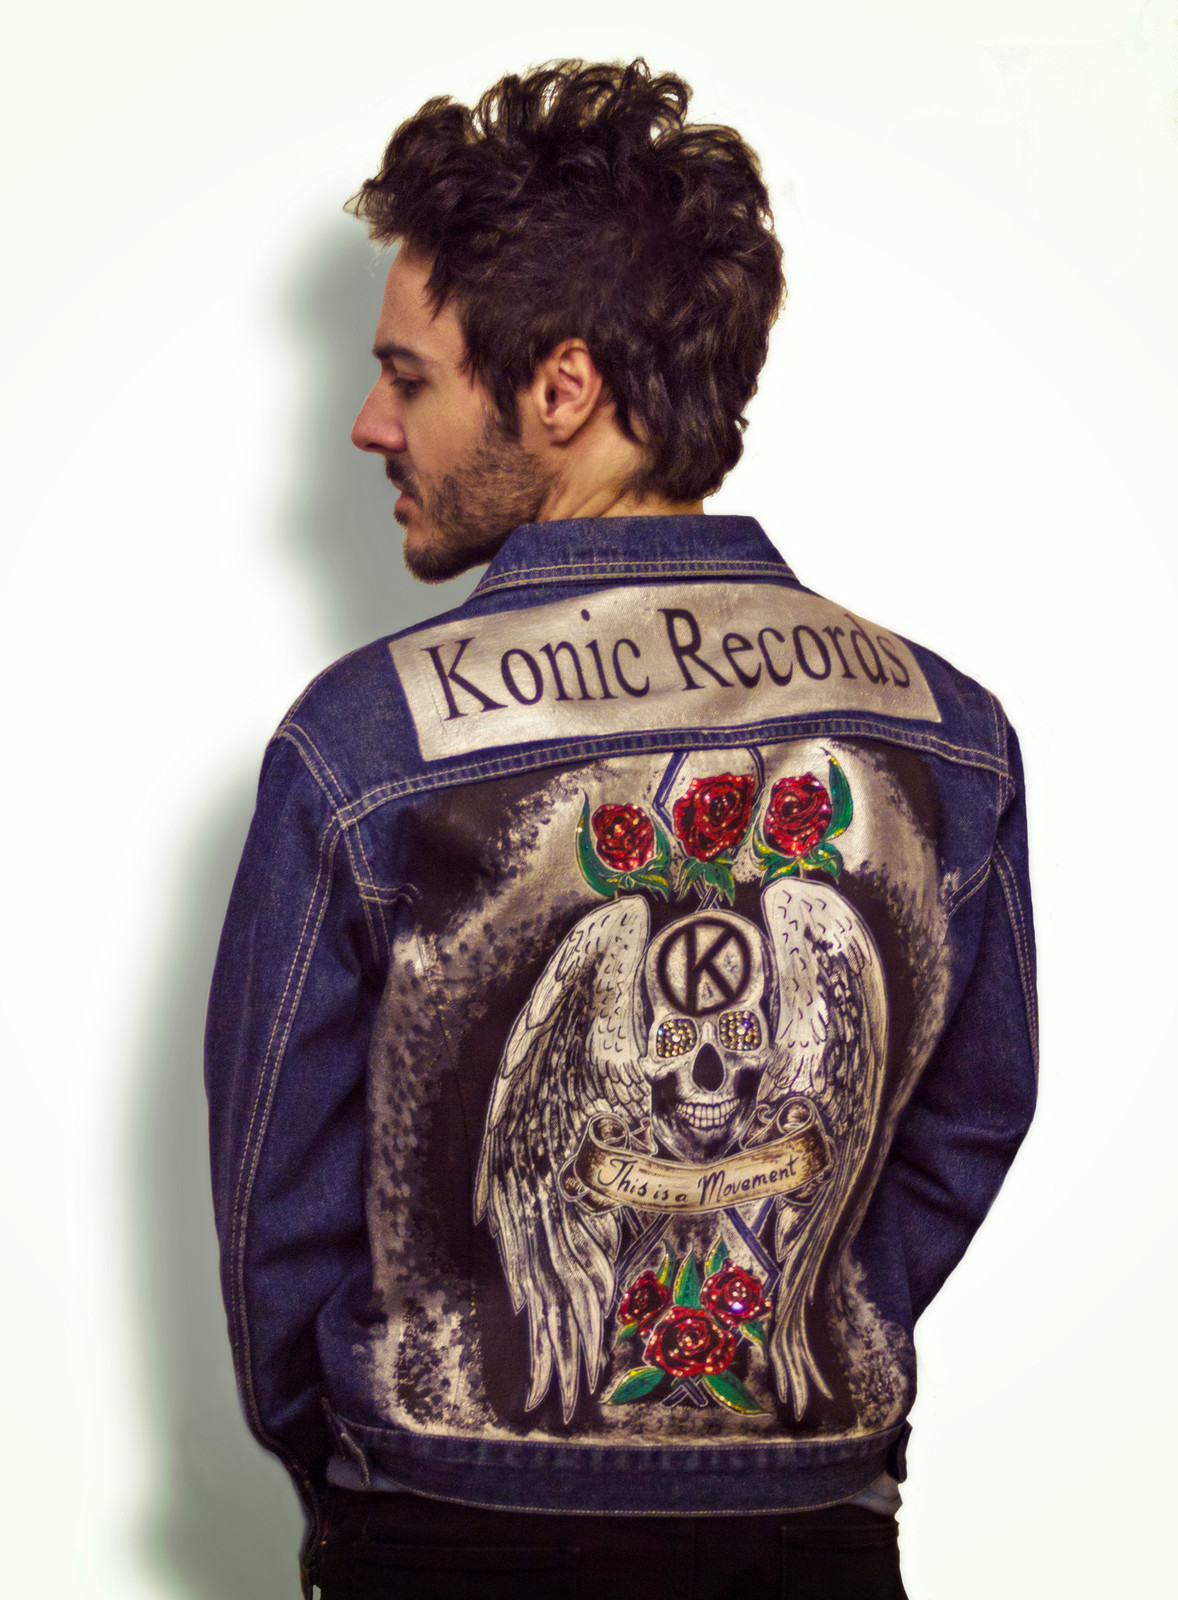 James Kennedy, Kyshera, Konic Records - Jean Jacket Designs